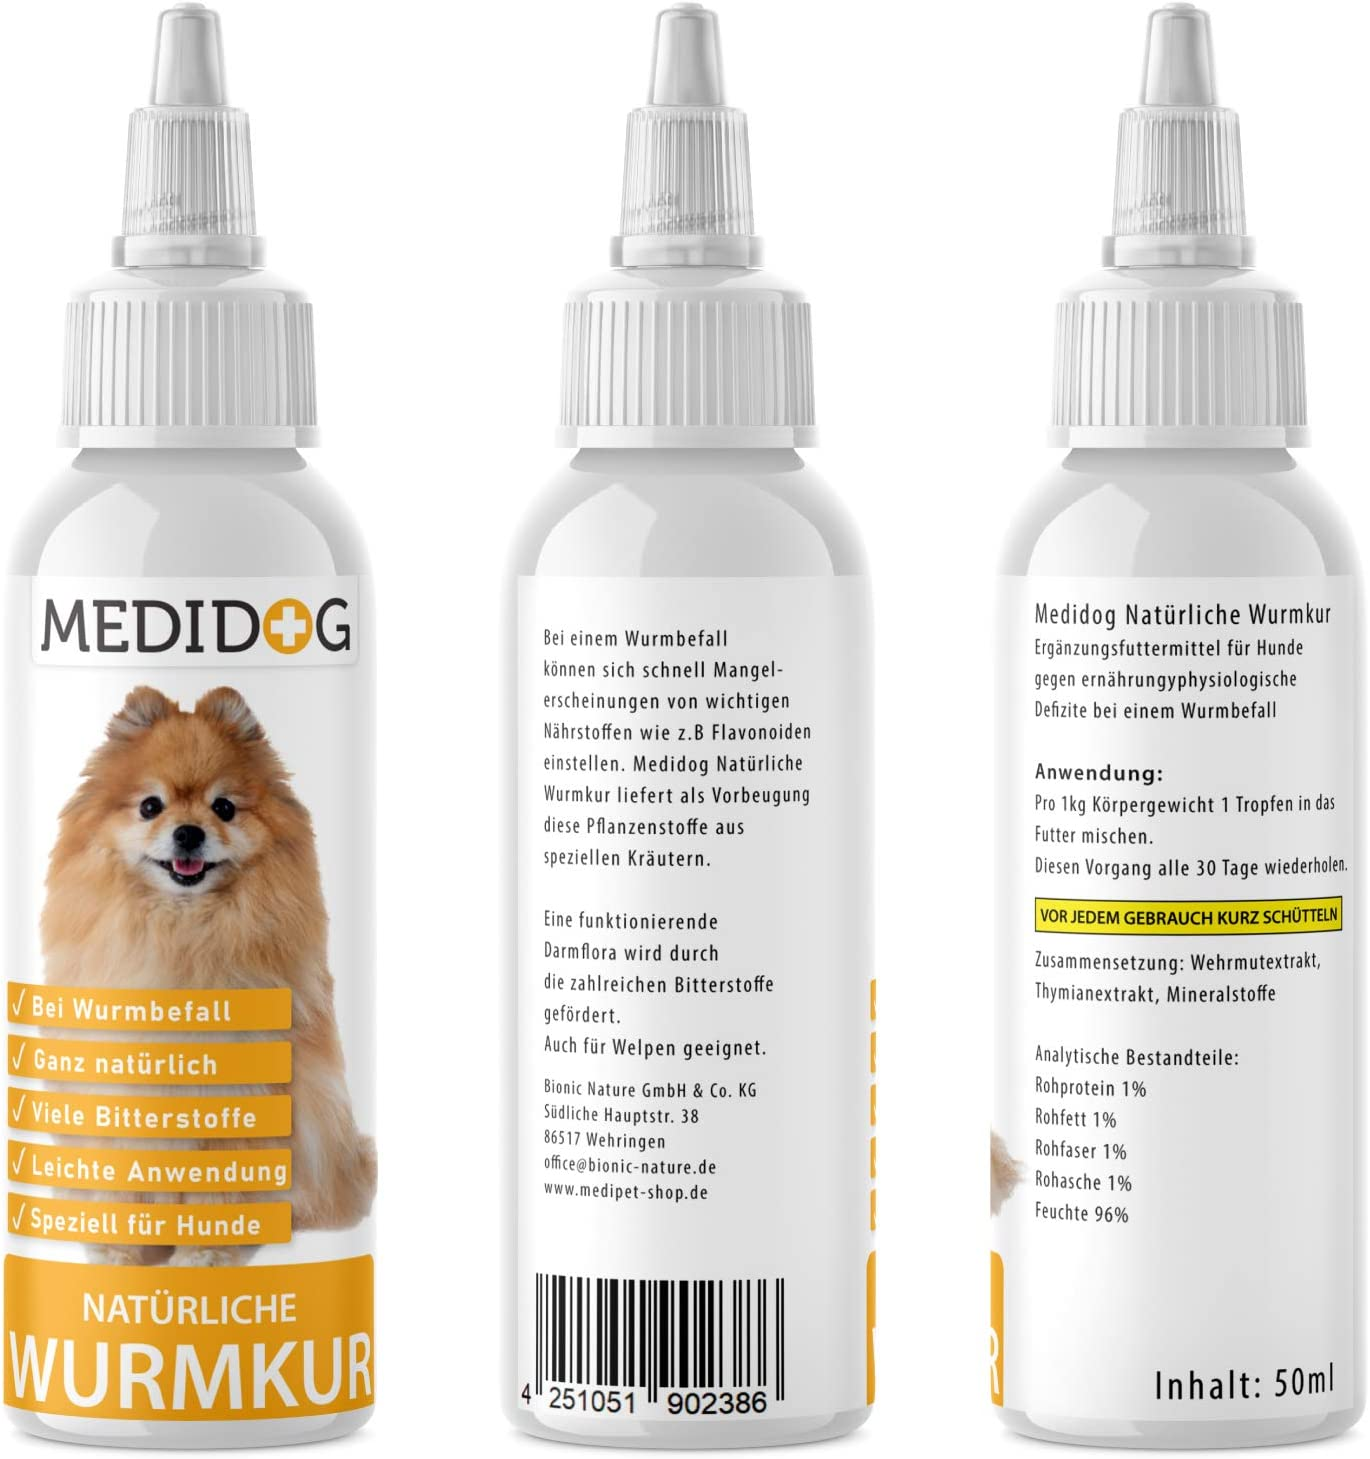 Medidog Naturliche Wurmkur Fur Hunde Bei Wurmbefall Giardien Flussige Wurm Tropfen Auch Fur Katzen Vogel Huhner Geeignet Amazon De Haustier